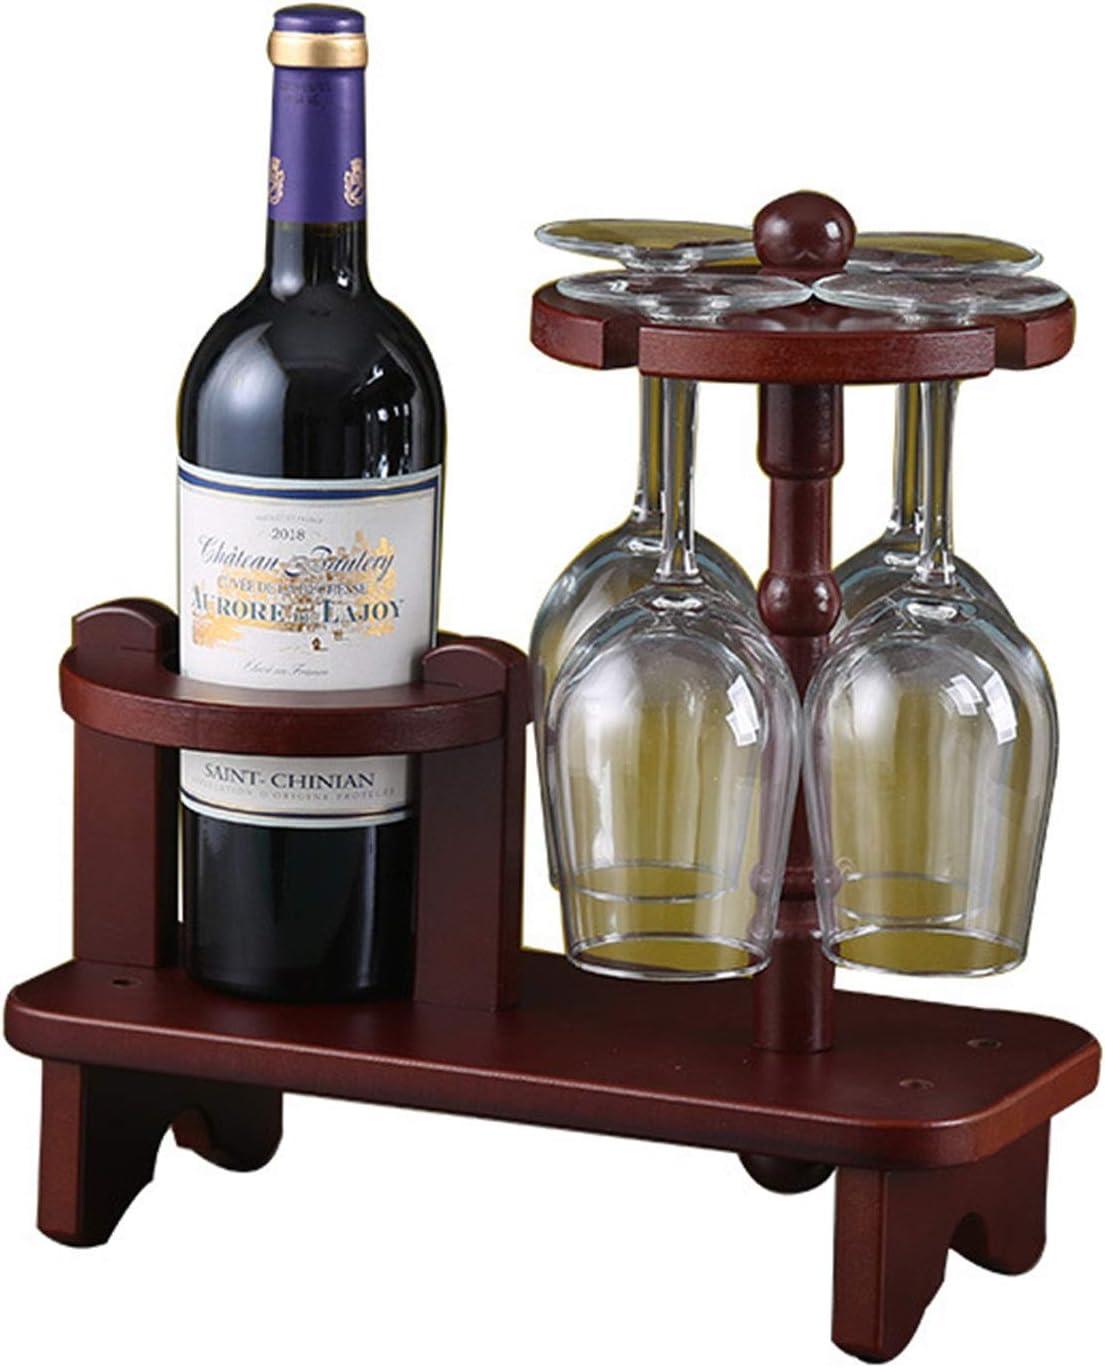 ROBDAE Decorative 5 ☆ very popular Wine Rack Ranking TOP3 Creative Gla Mushroom